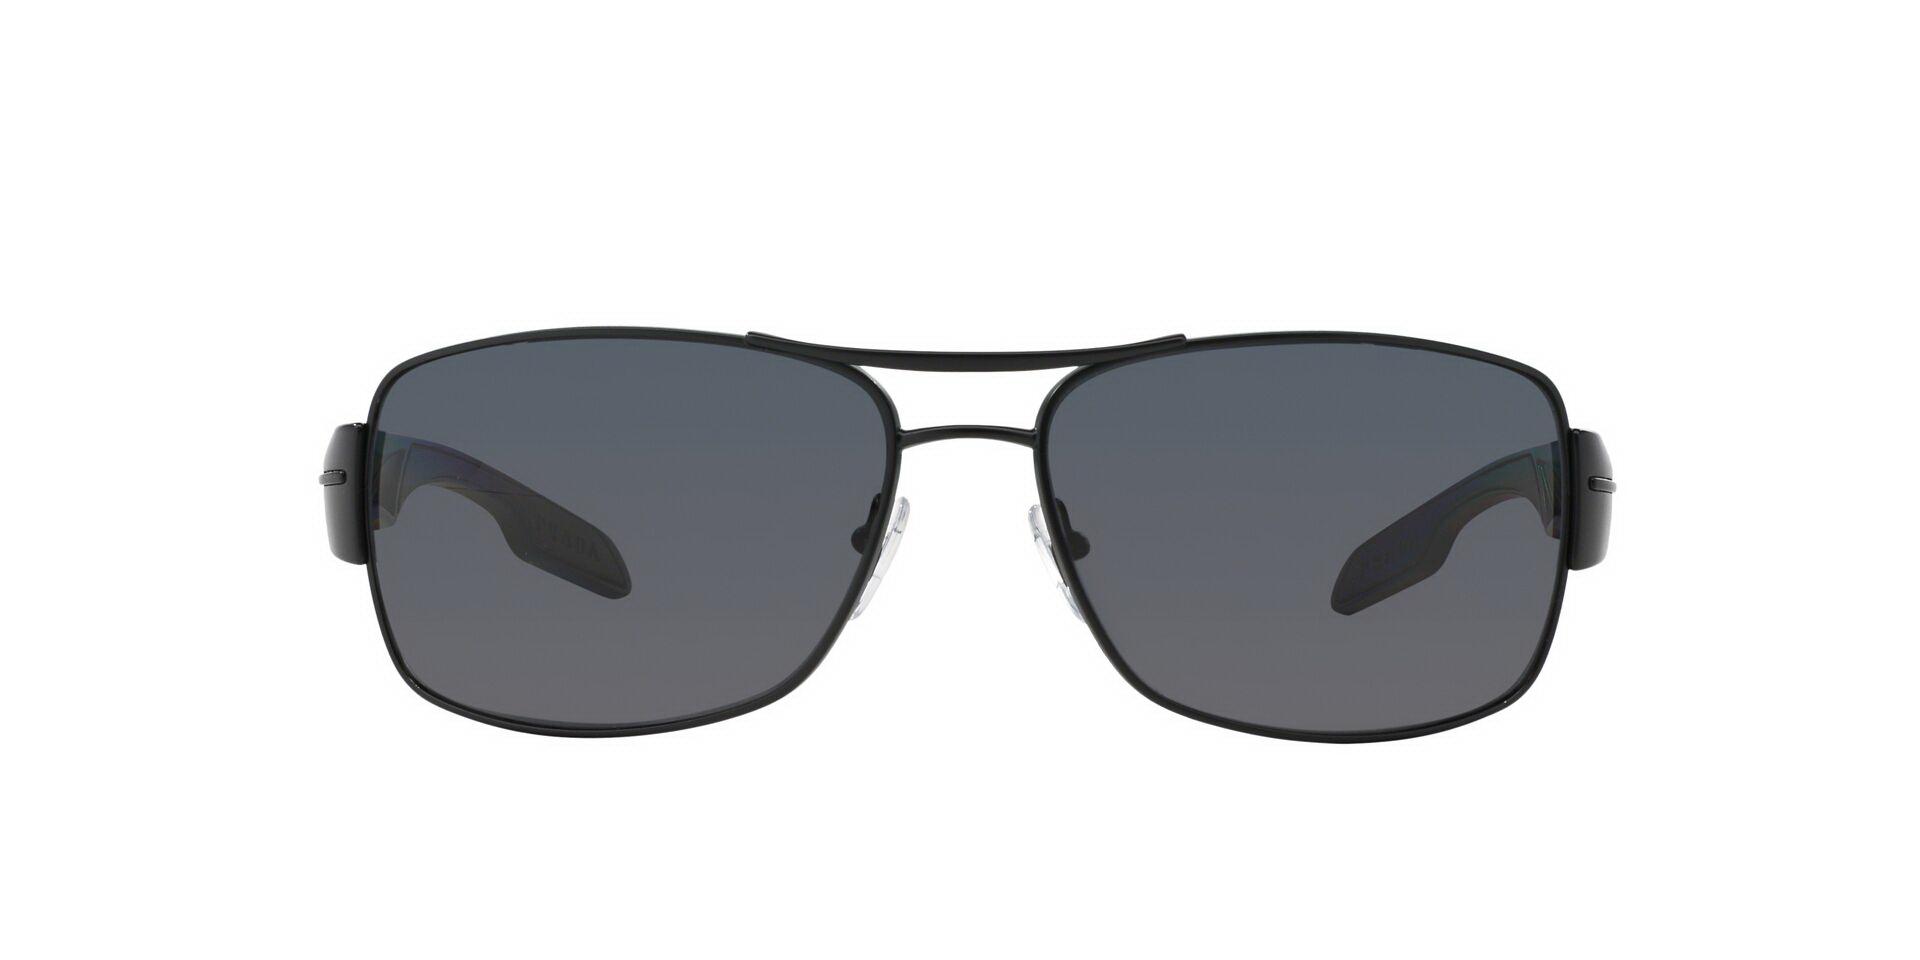 Солнцезащитные очки Очки с/з PRADA LINEA ROSSA 0PS53NS 1BO5Z1